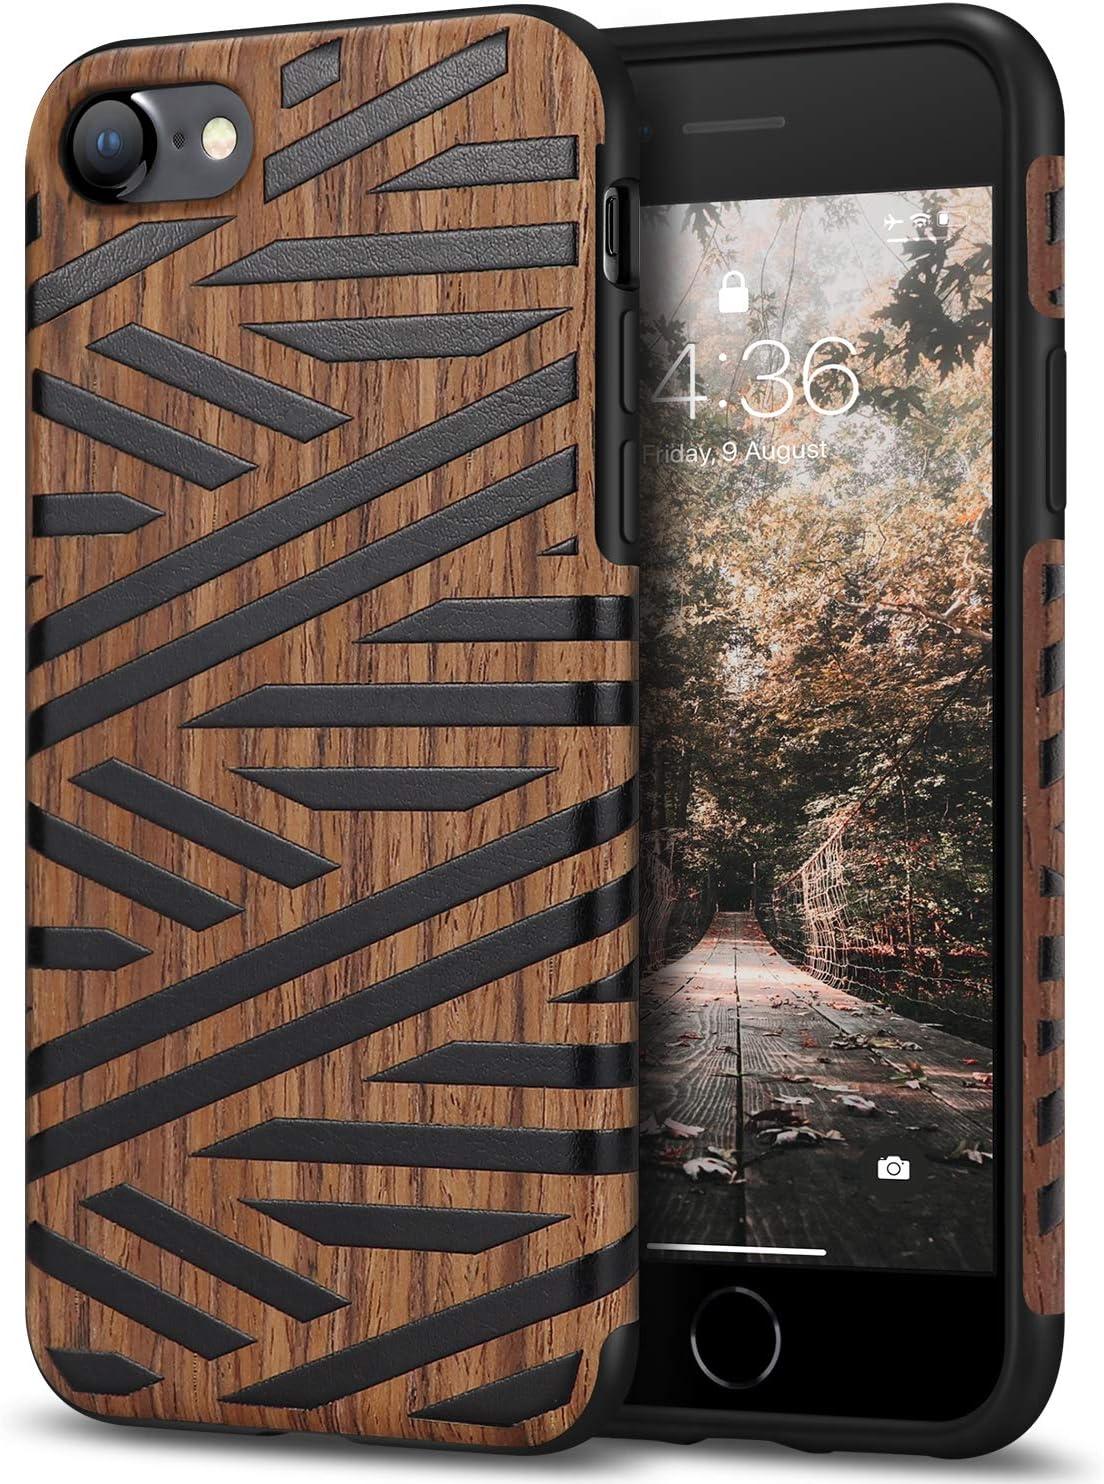 Tasikar Compatible with iPhone SE 2020 Case/iPhone 7 Case/iPhone 8 Case Easy Grip with Wood Grain Design Slim Hybrid Case (Leather & Wood)